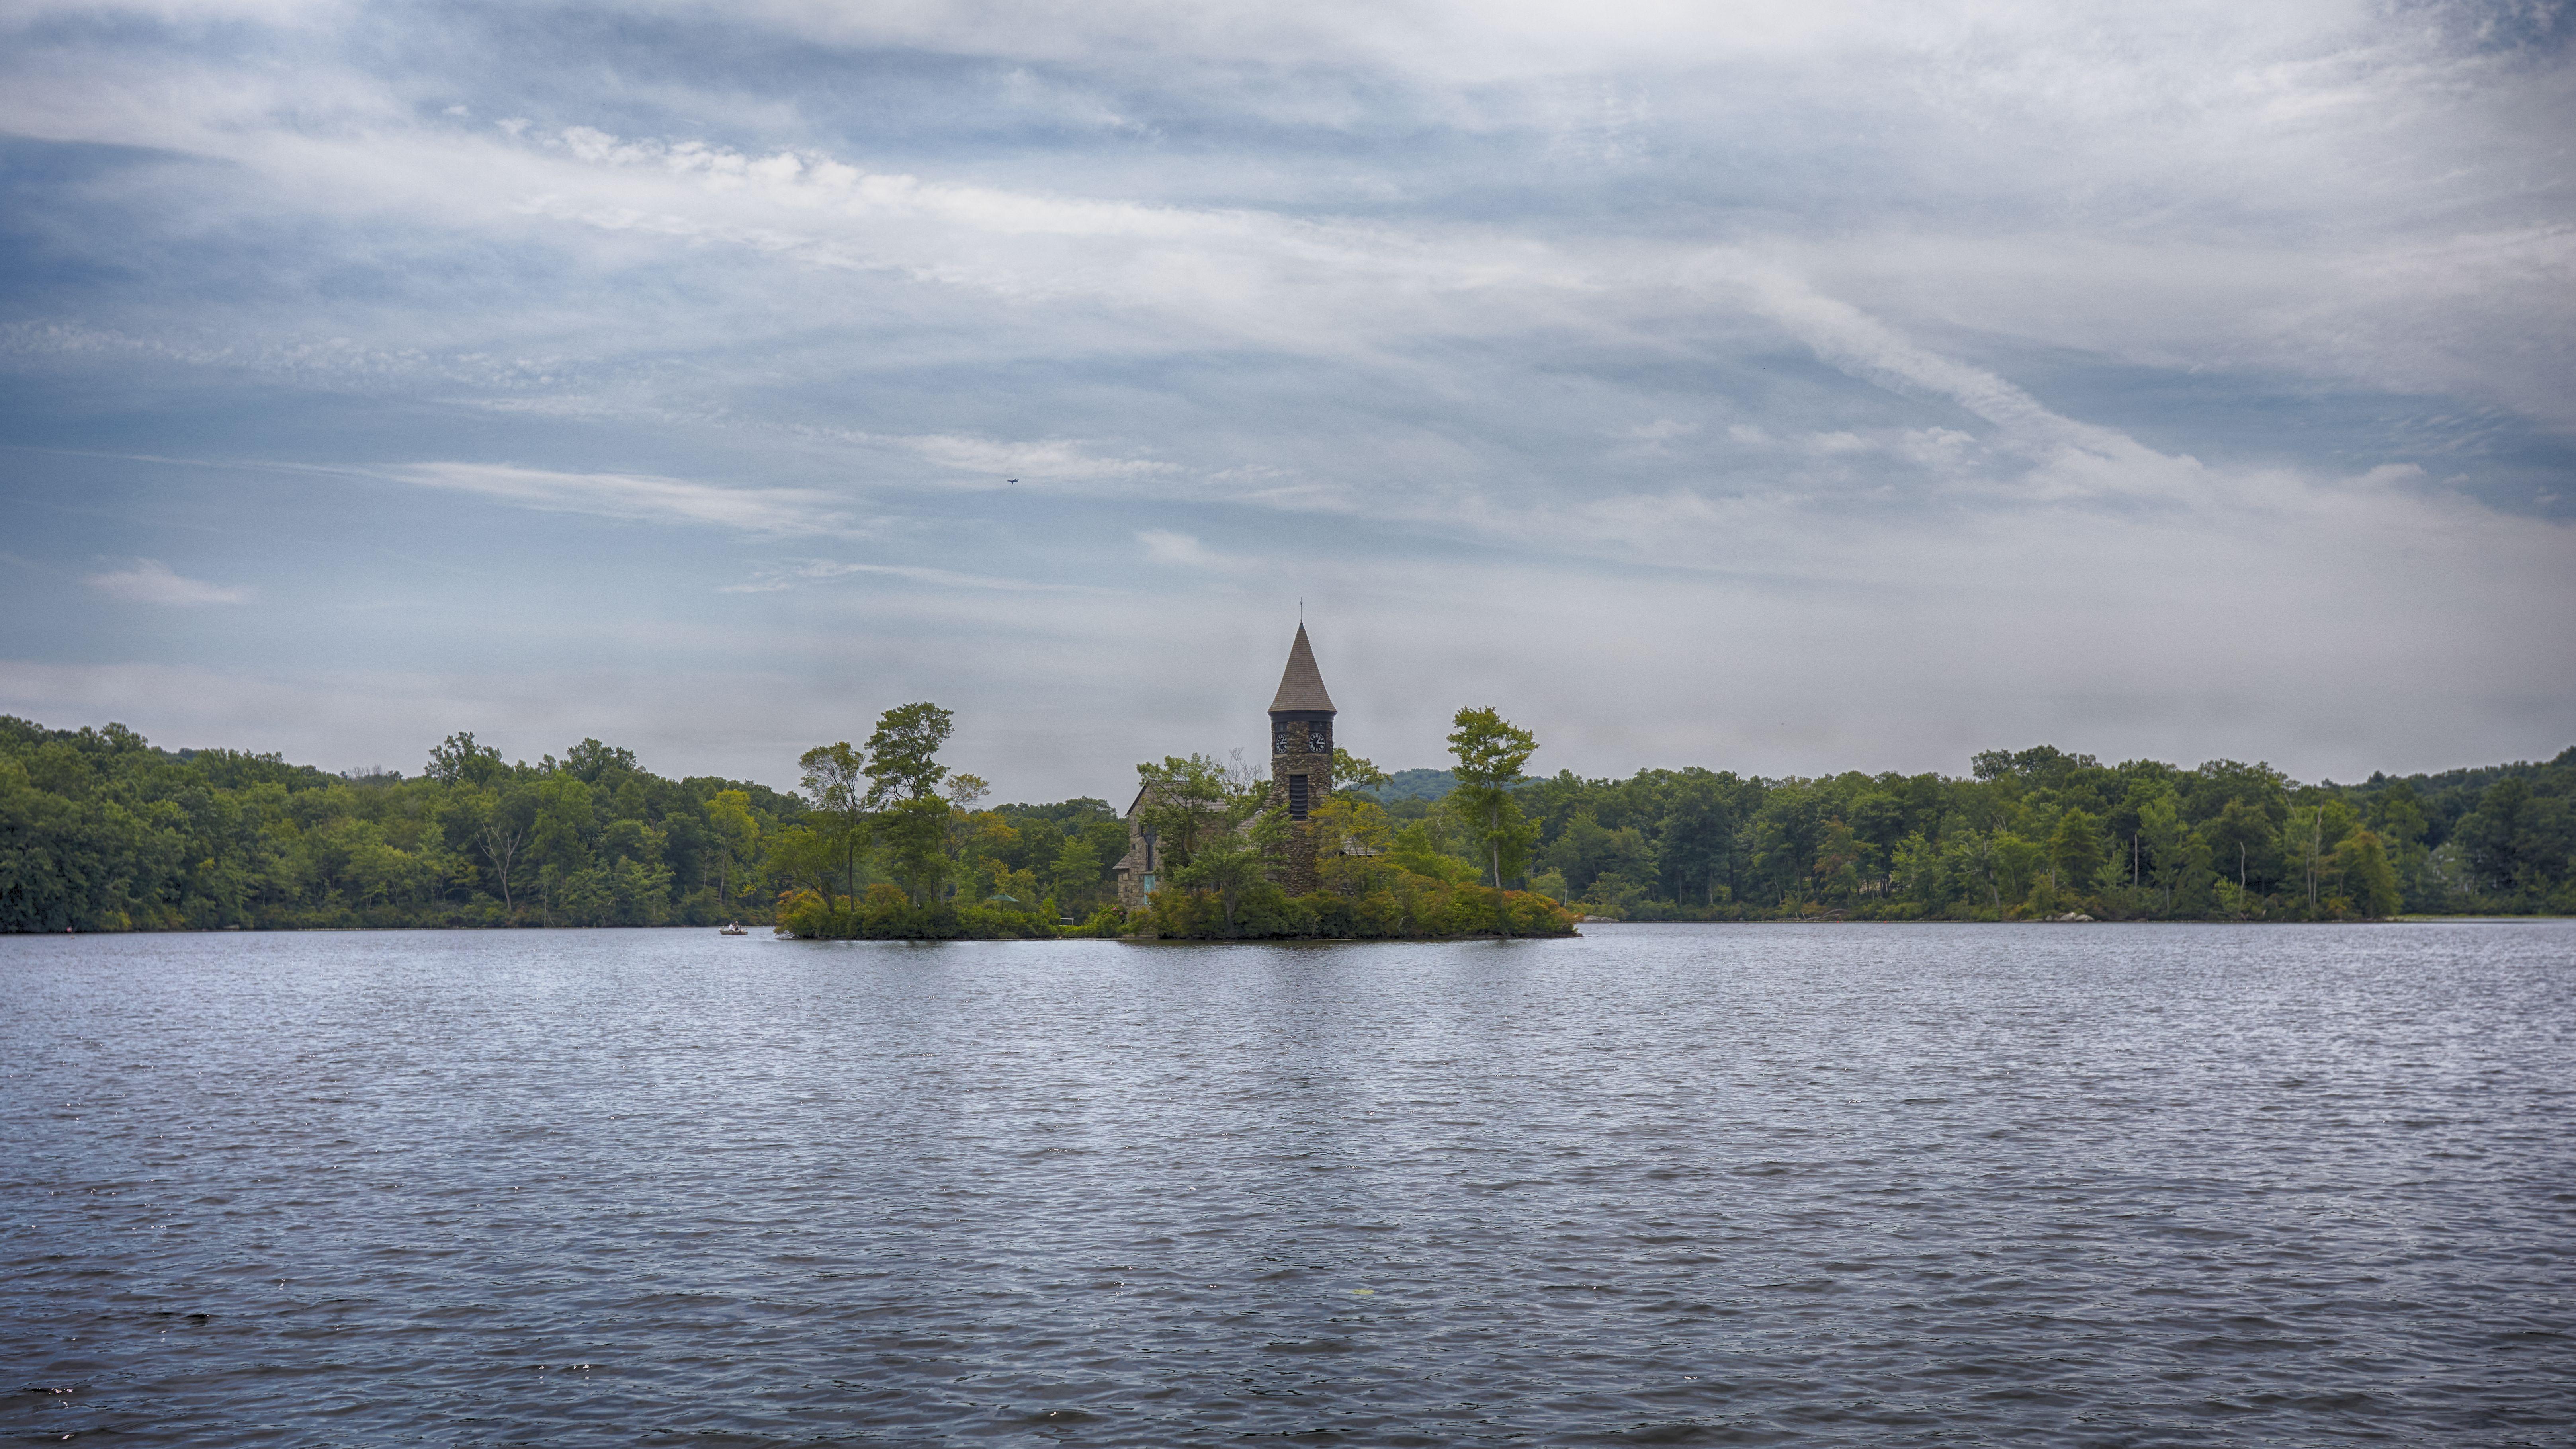 View of St. Hubert's Chapel across lake.